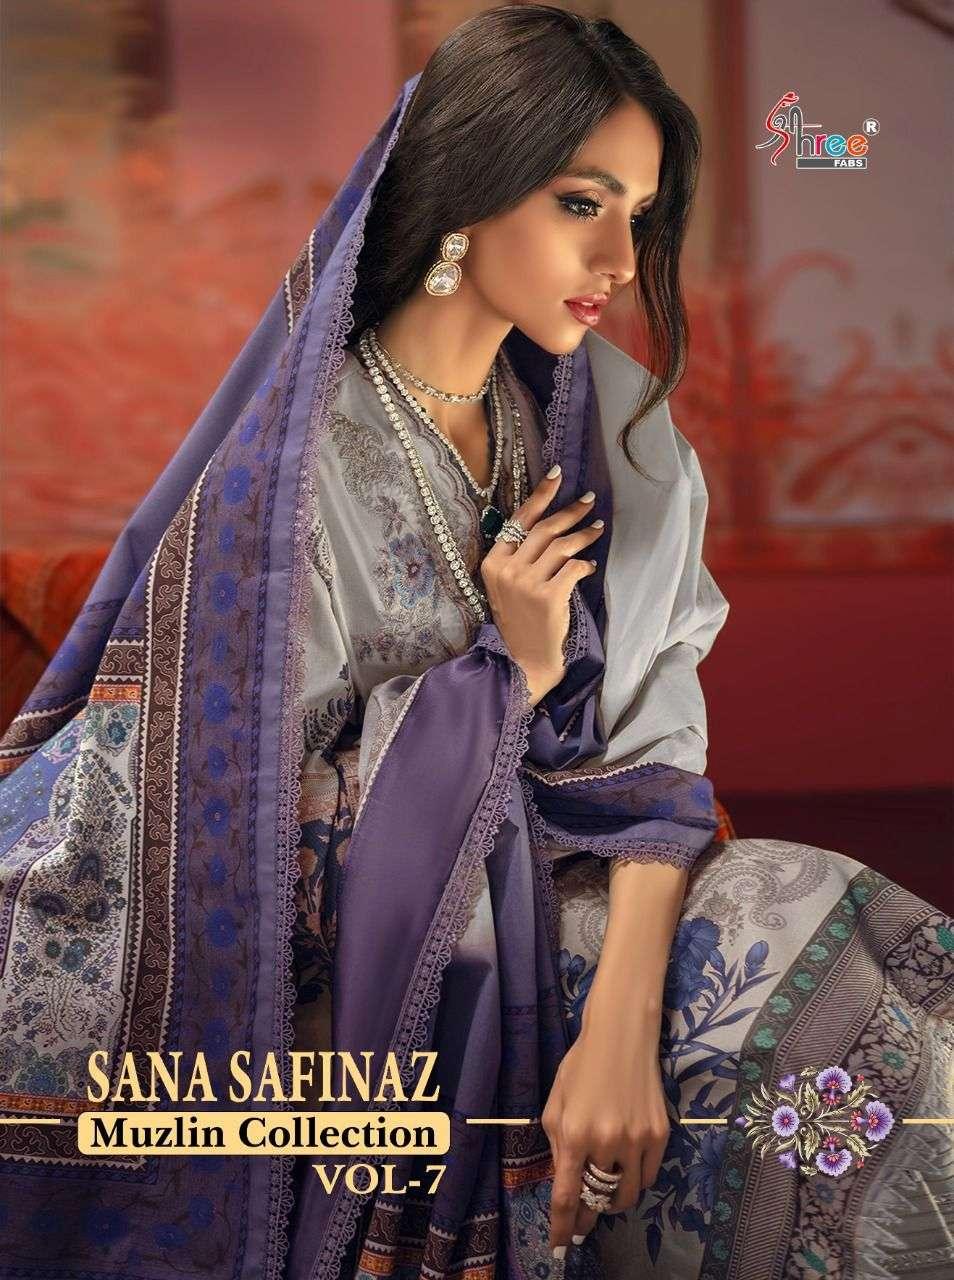 Shree Fabs Sana Safinaz Muzlin Collection Vol 7 Stylish Pakistani Suit Catalog Wholesale